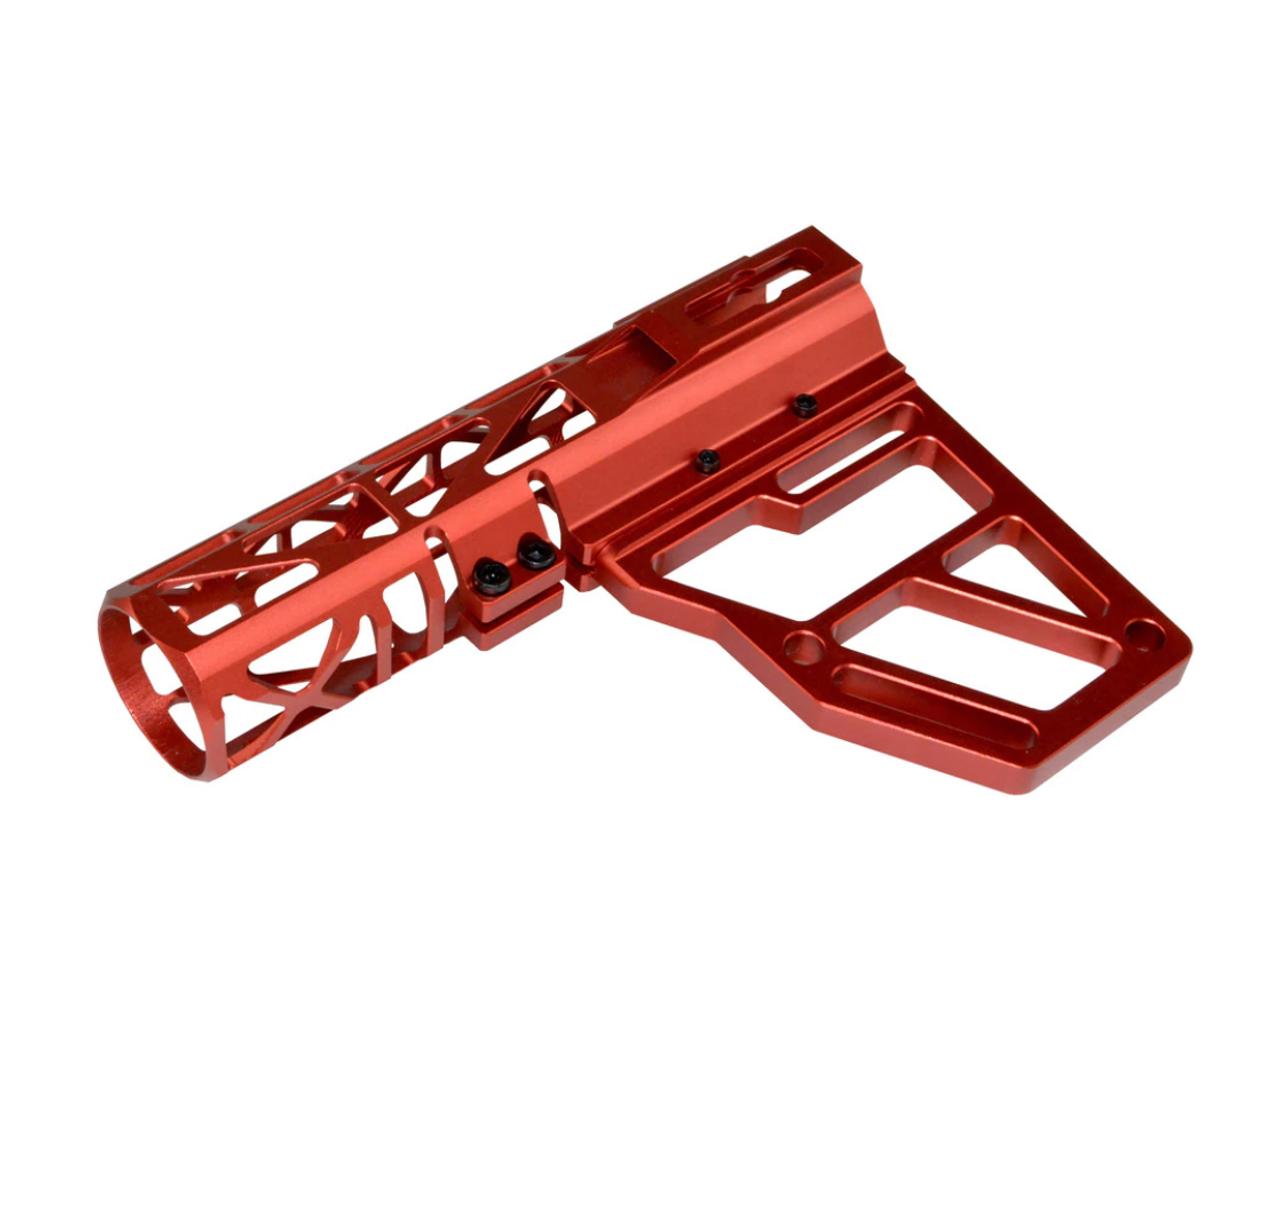 Skeletonized Pistol Brace Stabilizer, Red Anodized Aluminum